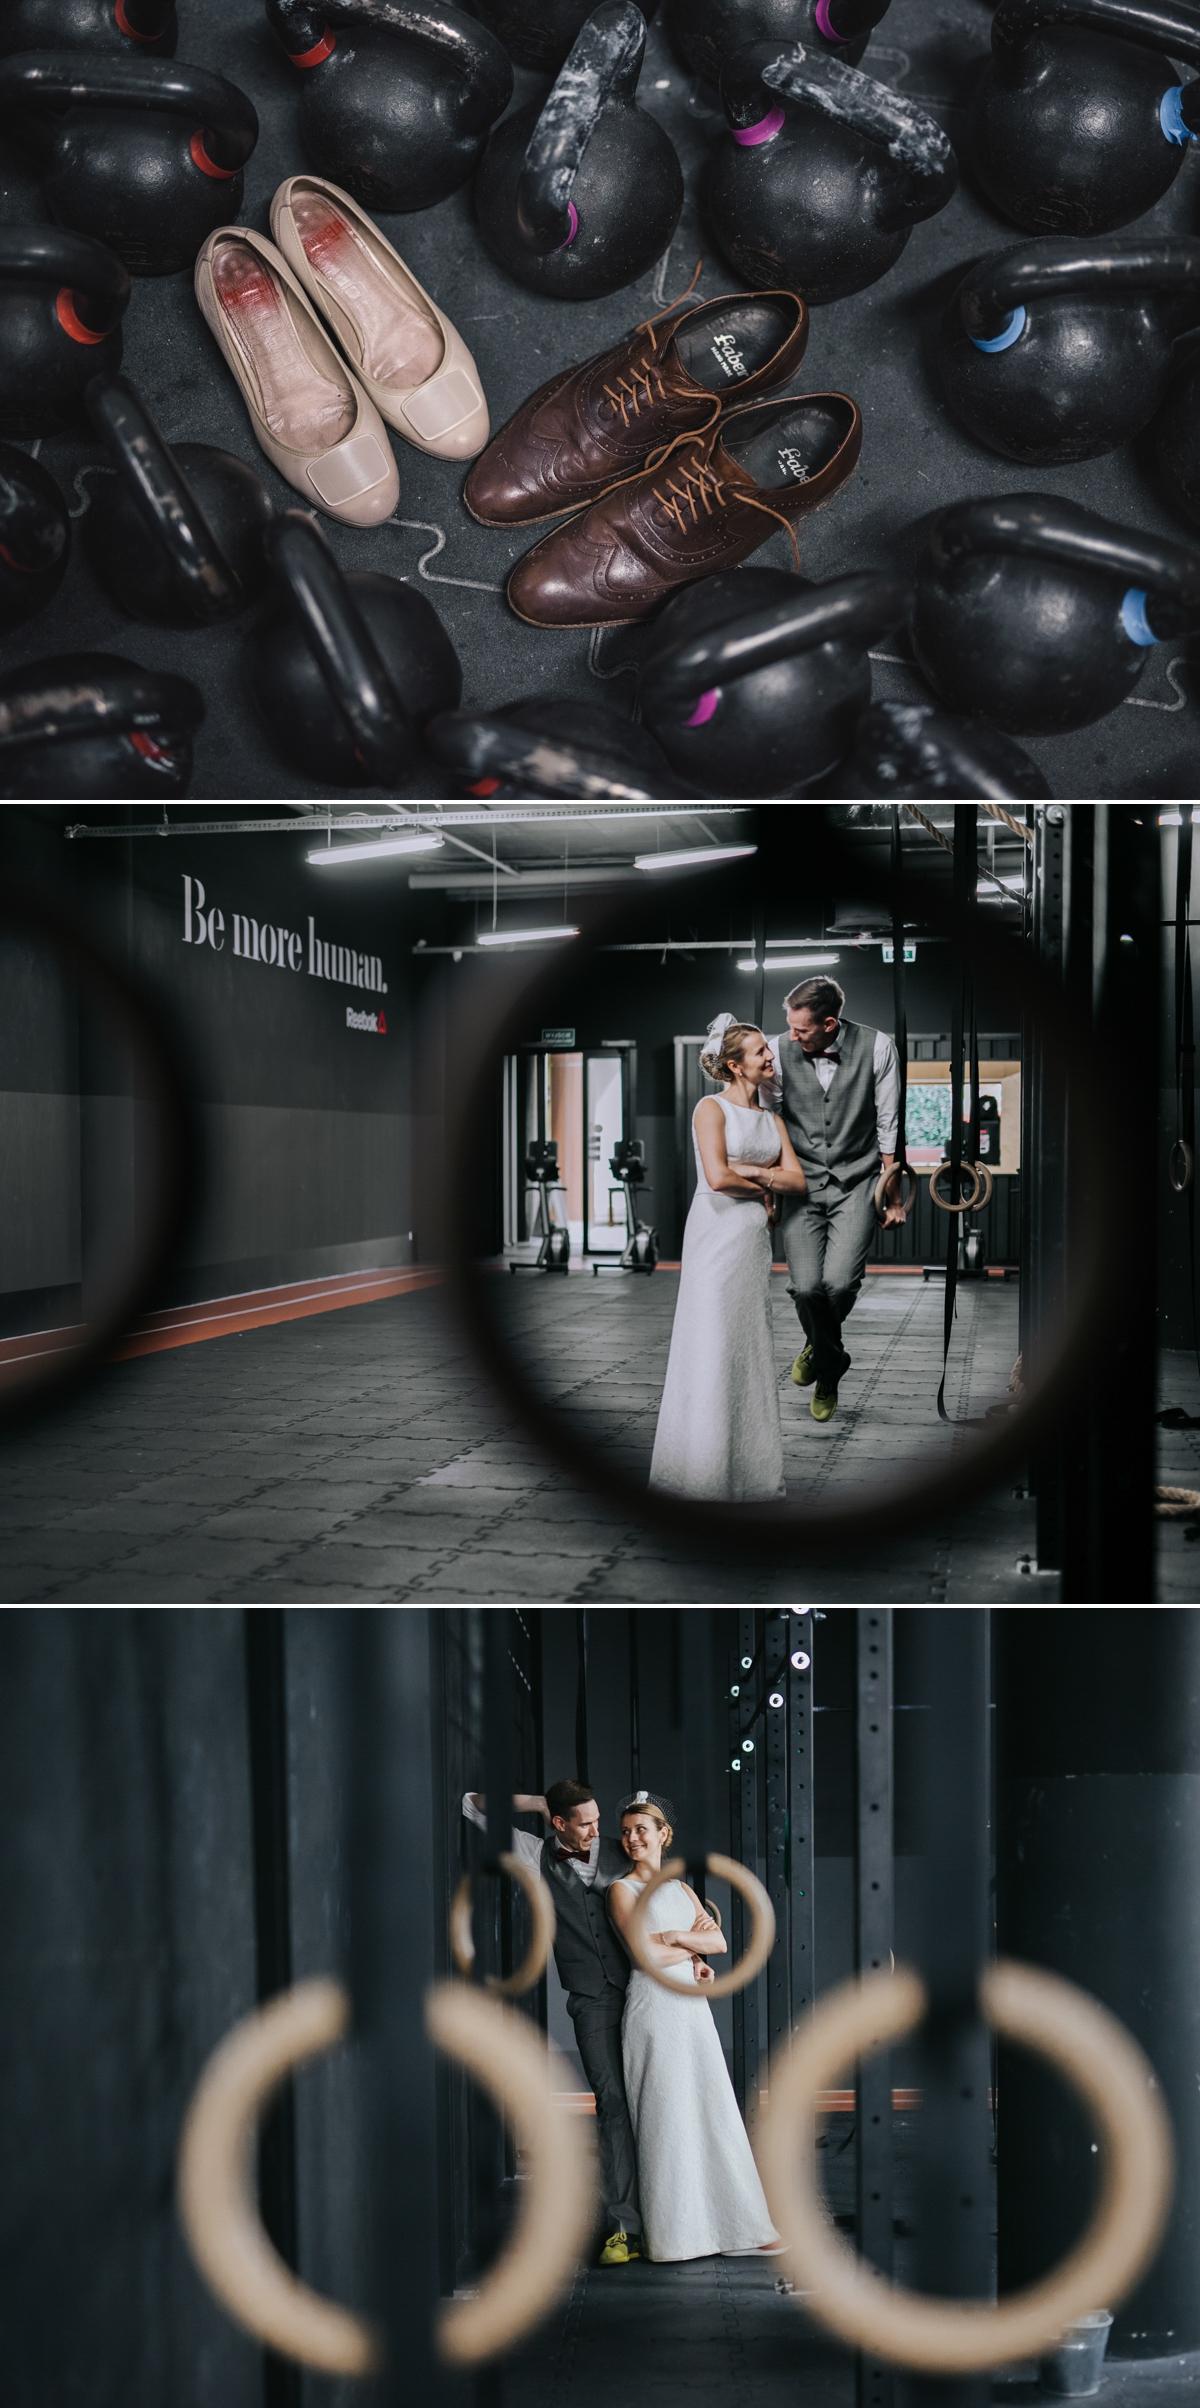 crossfit_wedding01